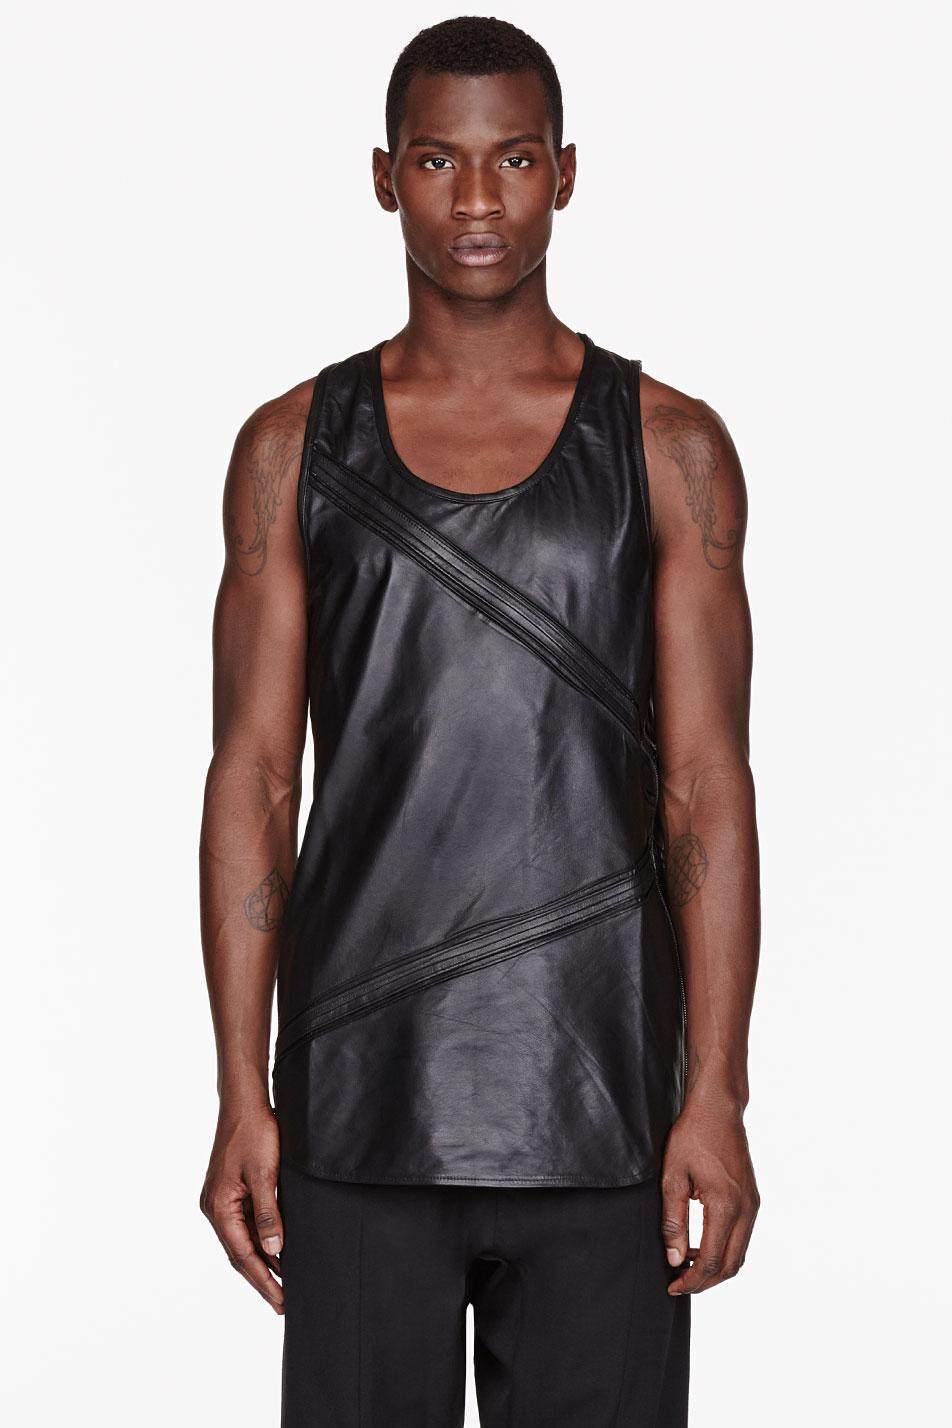 En Noir Black Leather Pin Tuck Tank Top In Black For Men